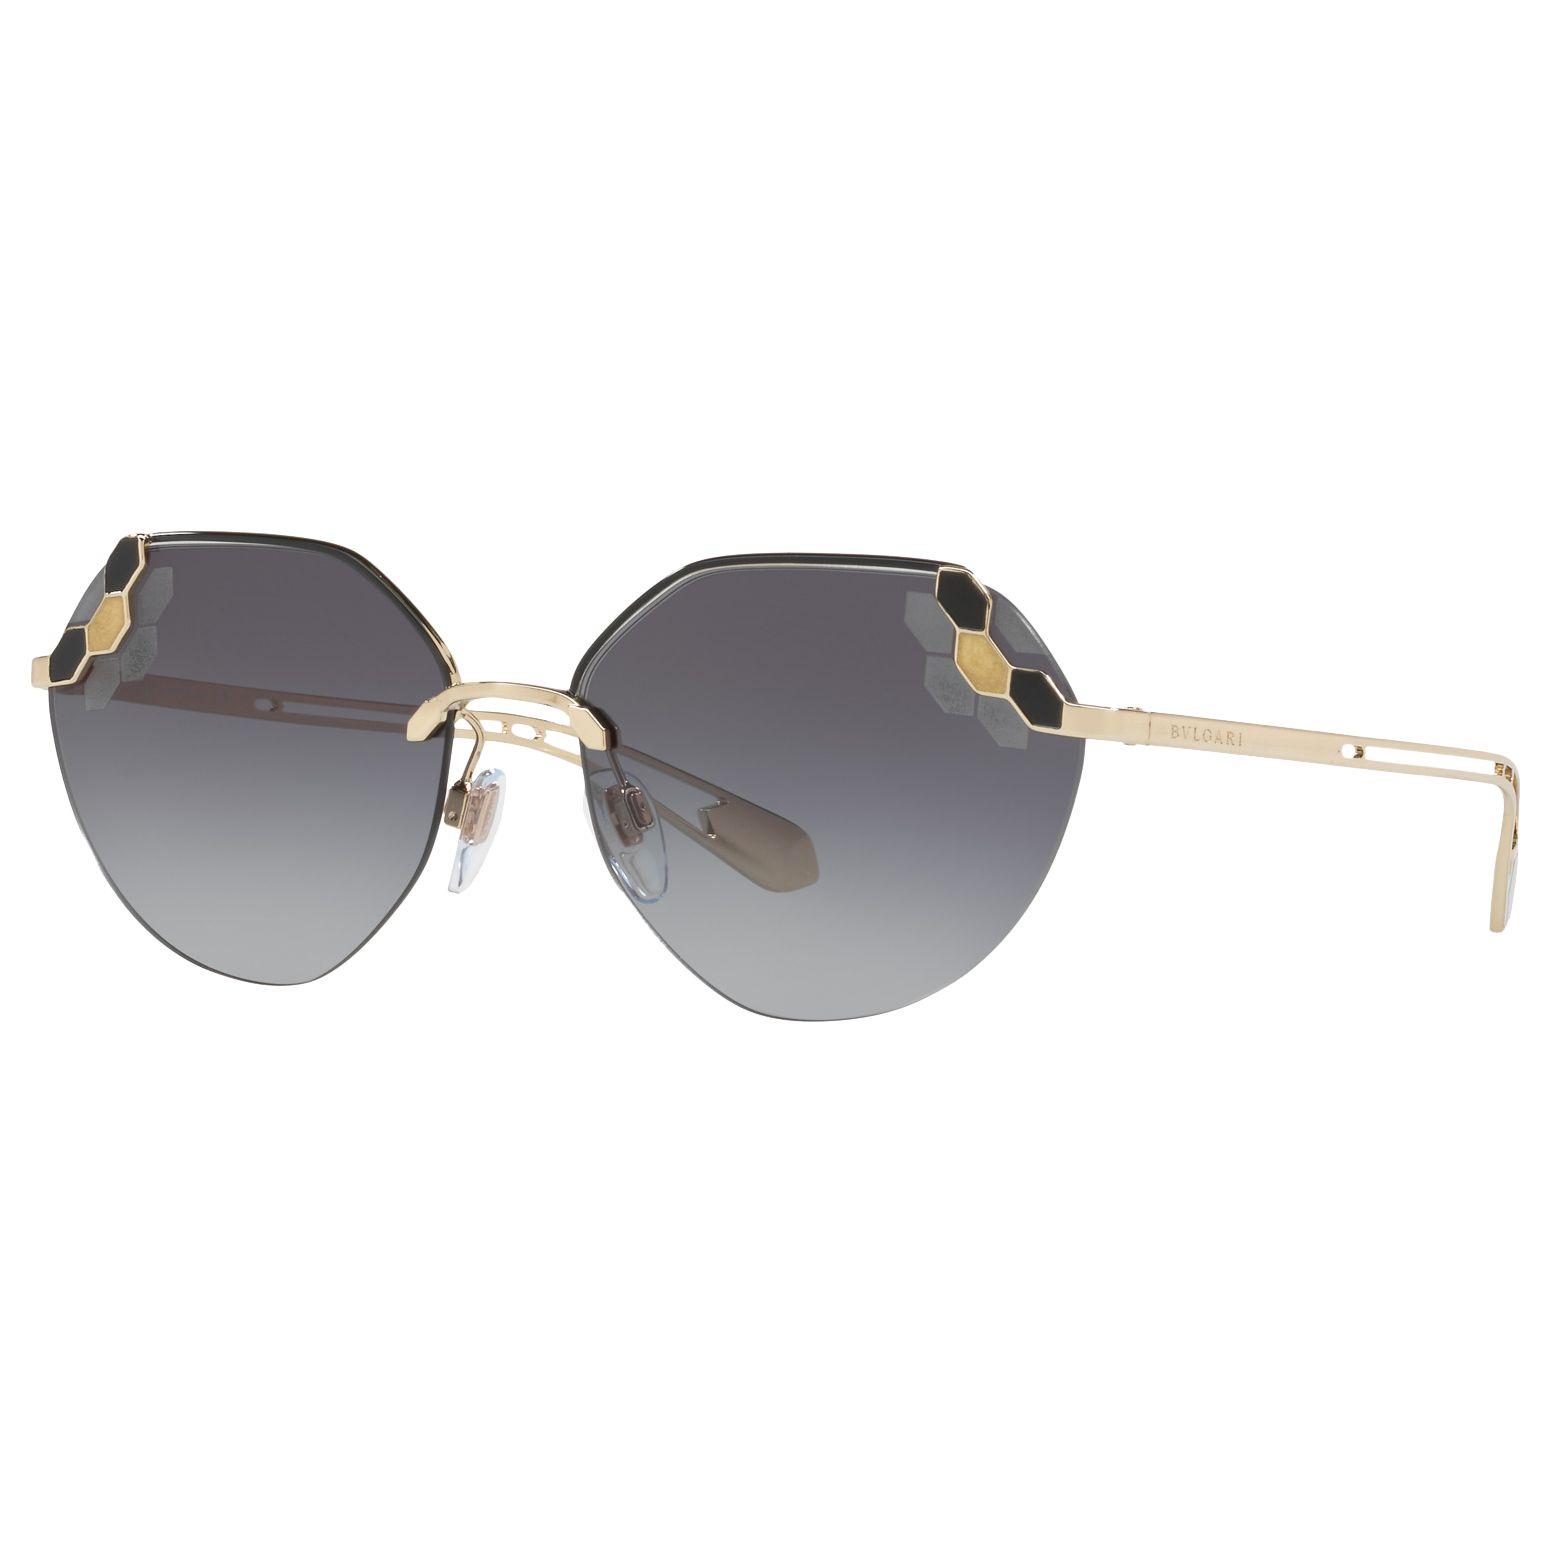 Bvlgari BVLGARI BV6099 Geometric Sunglasses, Gold/Grey Gradient